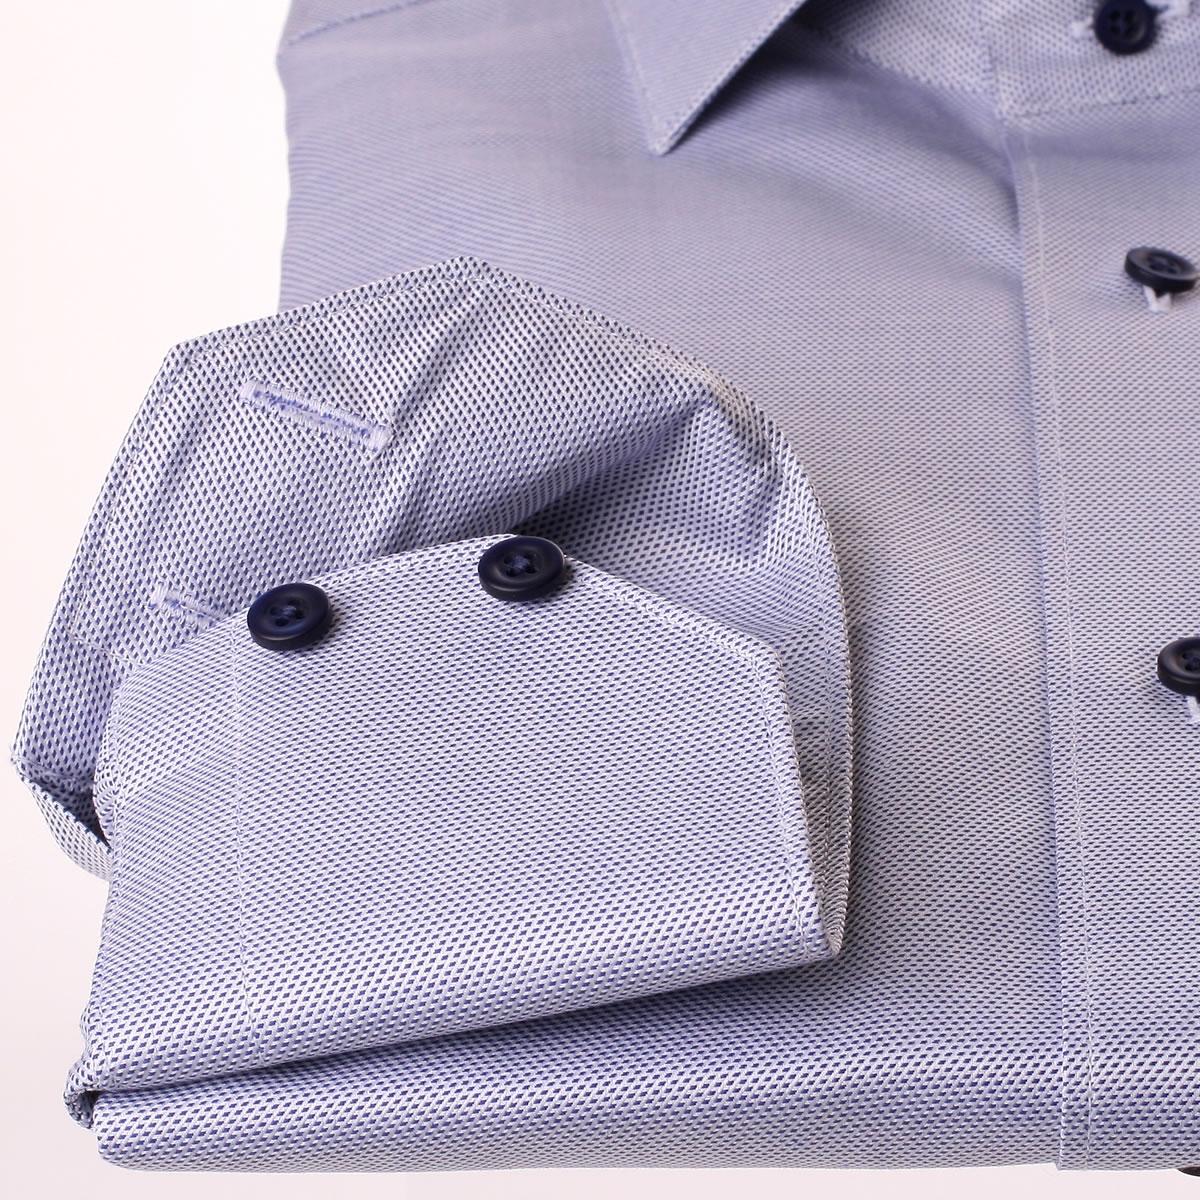 chemise en tissu natt bleu fonc et blanc. Black Bedroom Furniture Sets. Home Design Ideas